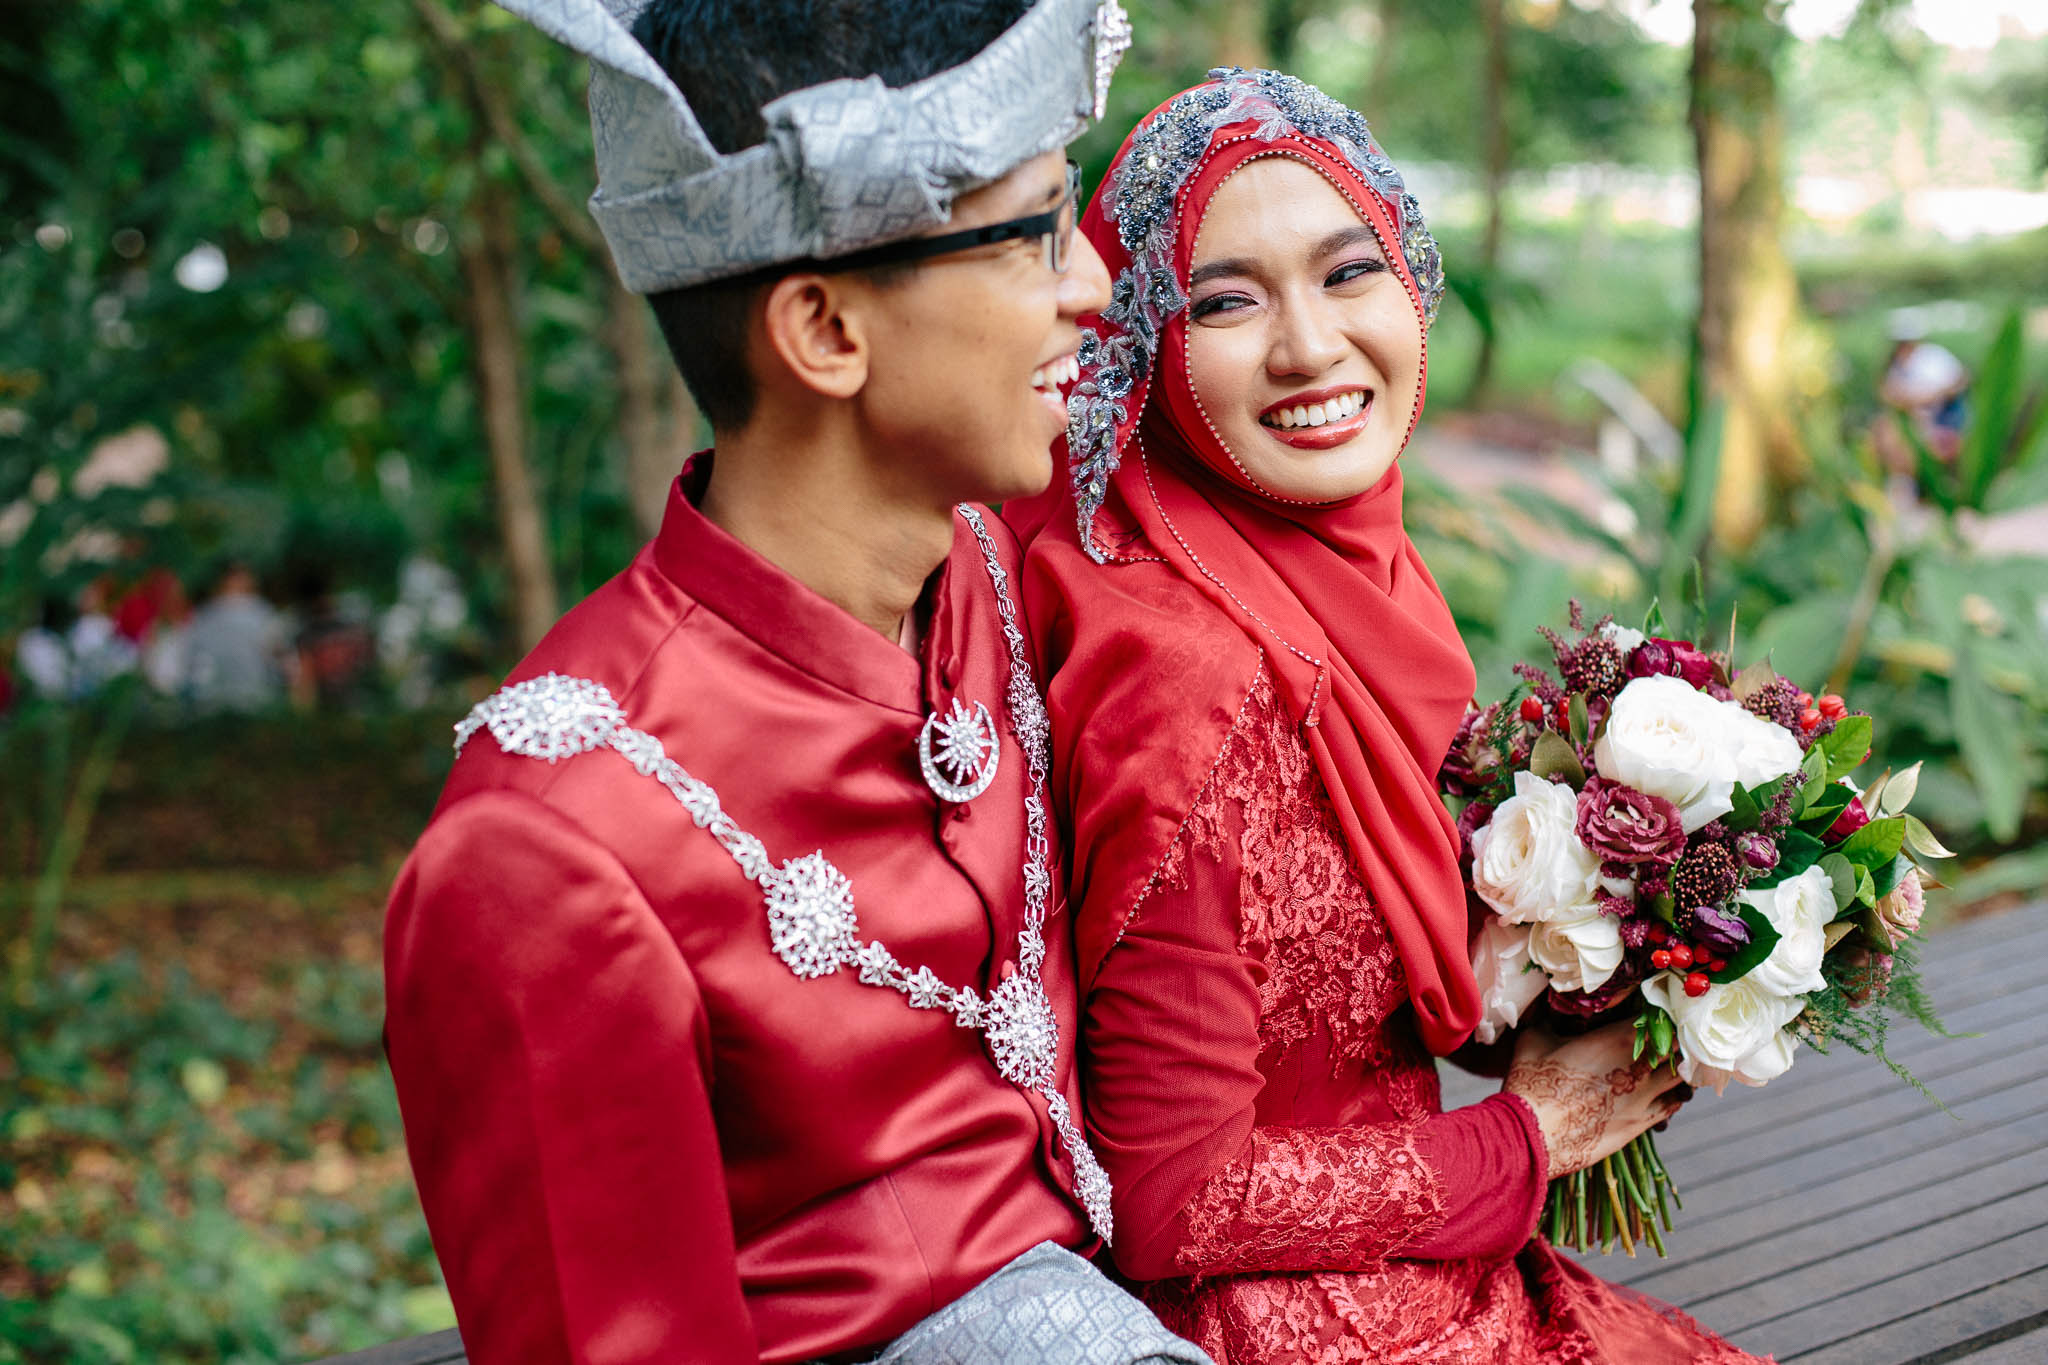 singapore-wedding-photographer-sharalyn-syazwan-069.jpg